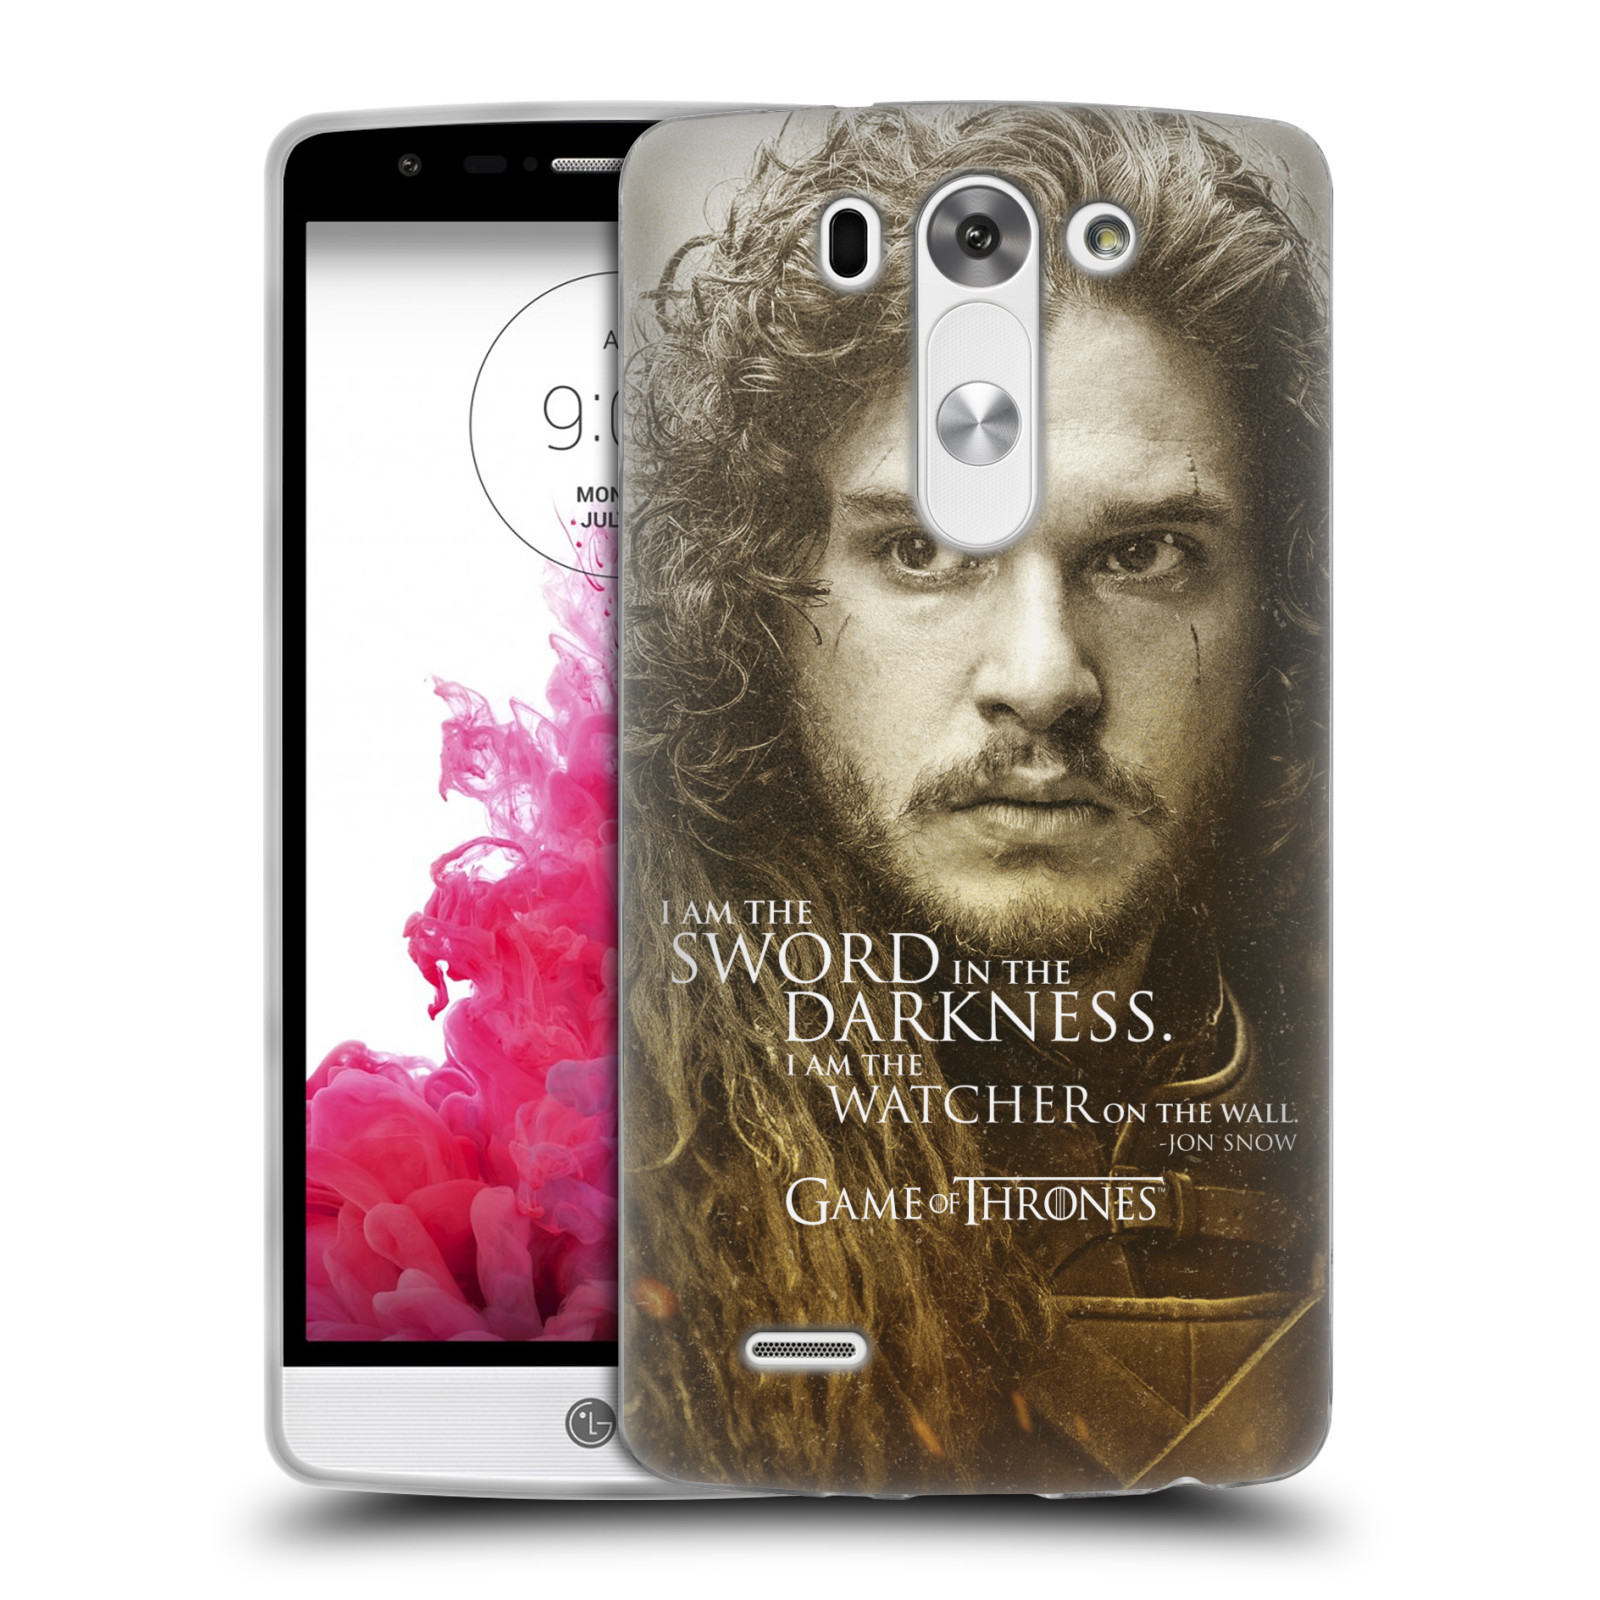 Silikonové pouzdro na mobil LG G3s HEAD CASE Hra o trůny - Jon Snow (Silikonový kryt či obal na mobilní telefon s licencovaným motivem Hra o trůny - Game Of Thrones pro LG G3s)